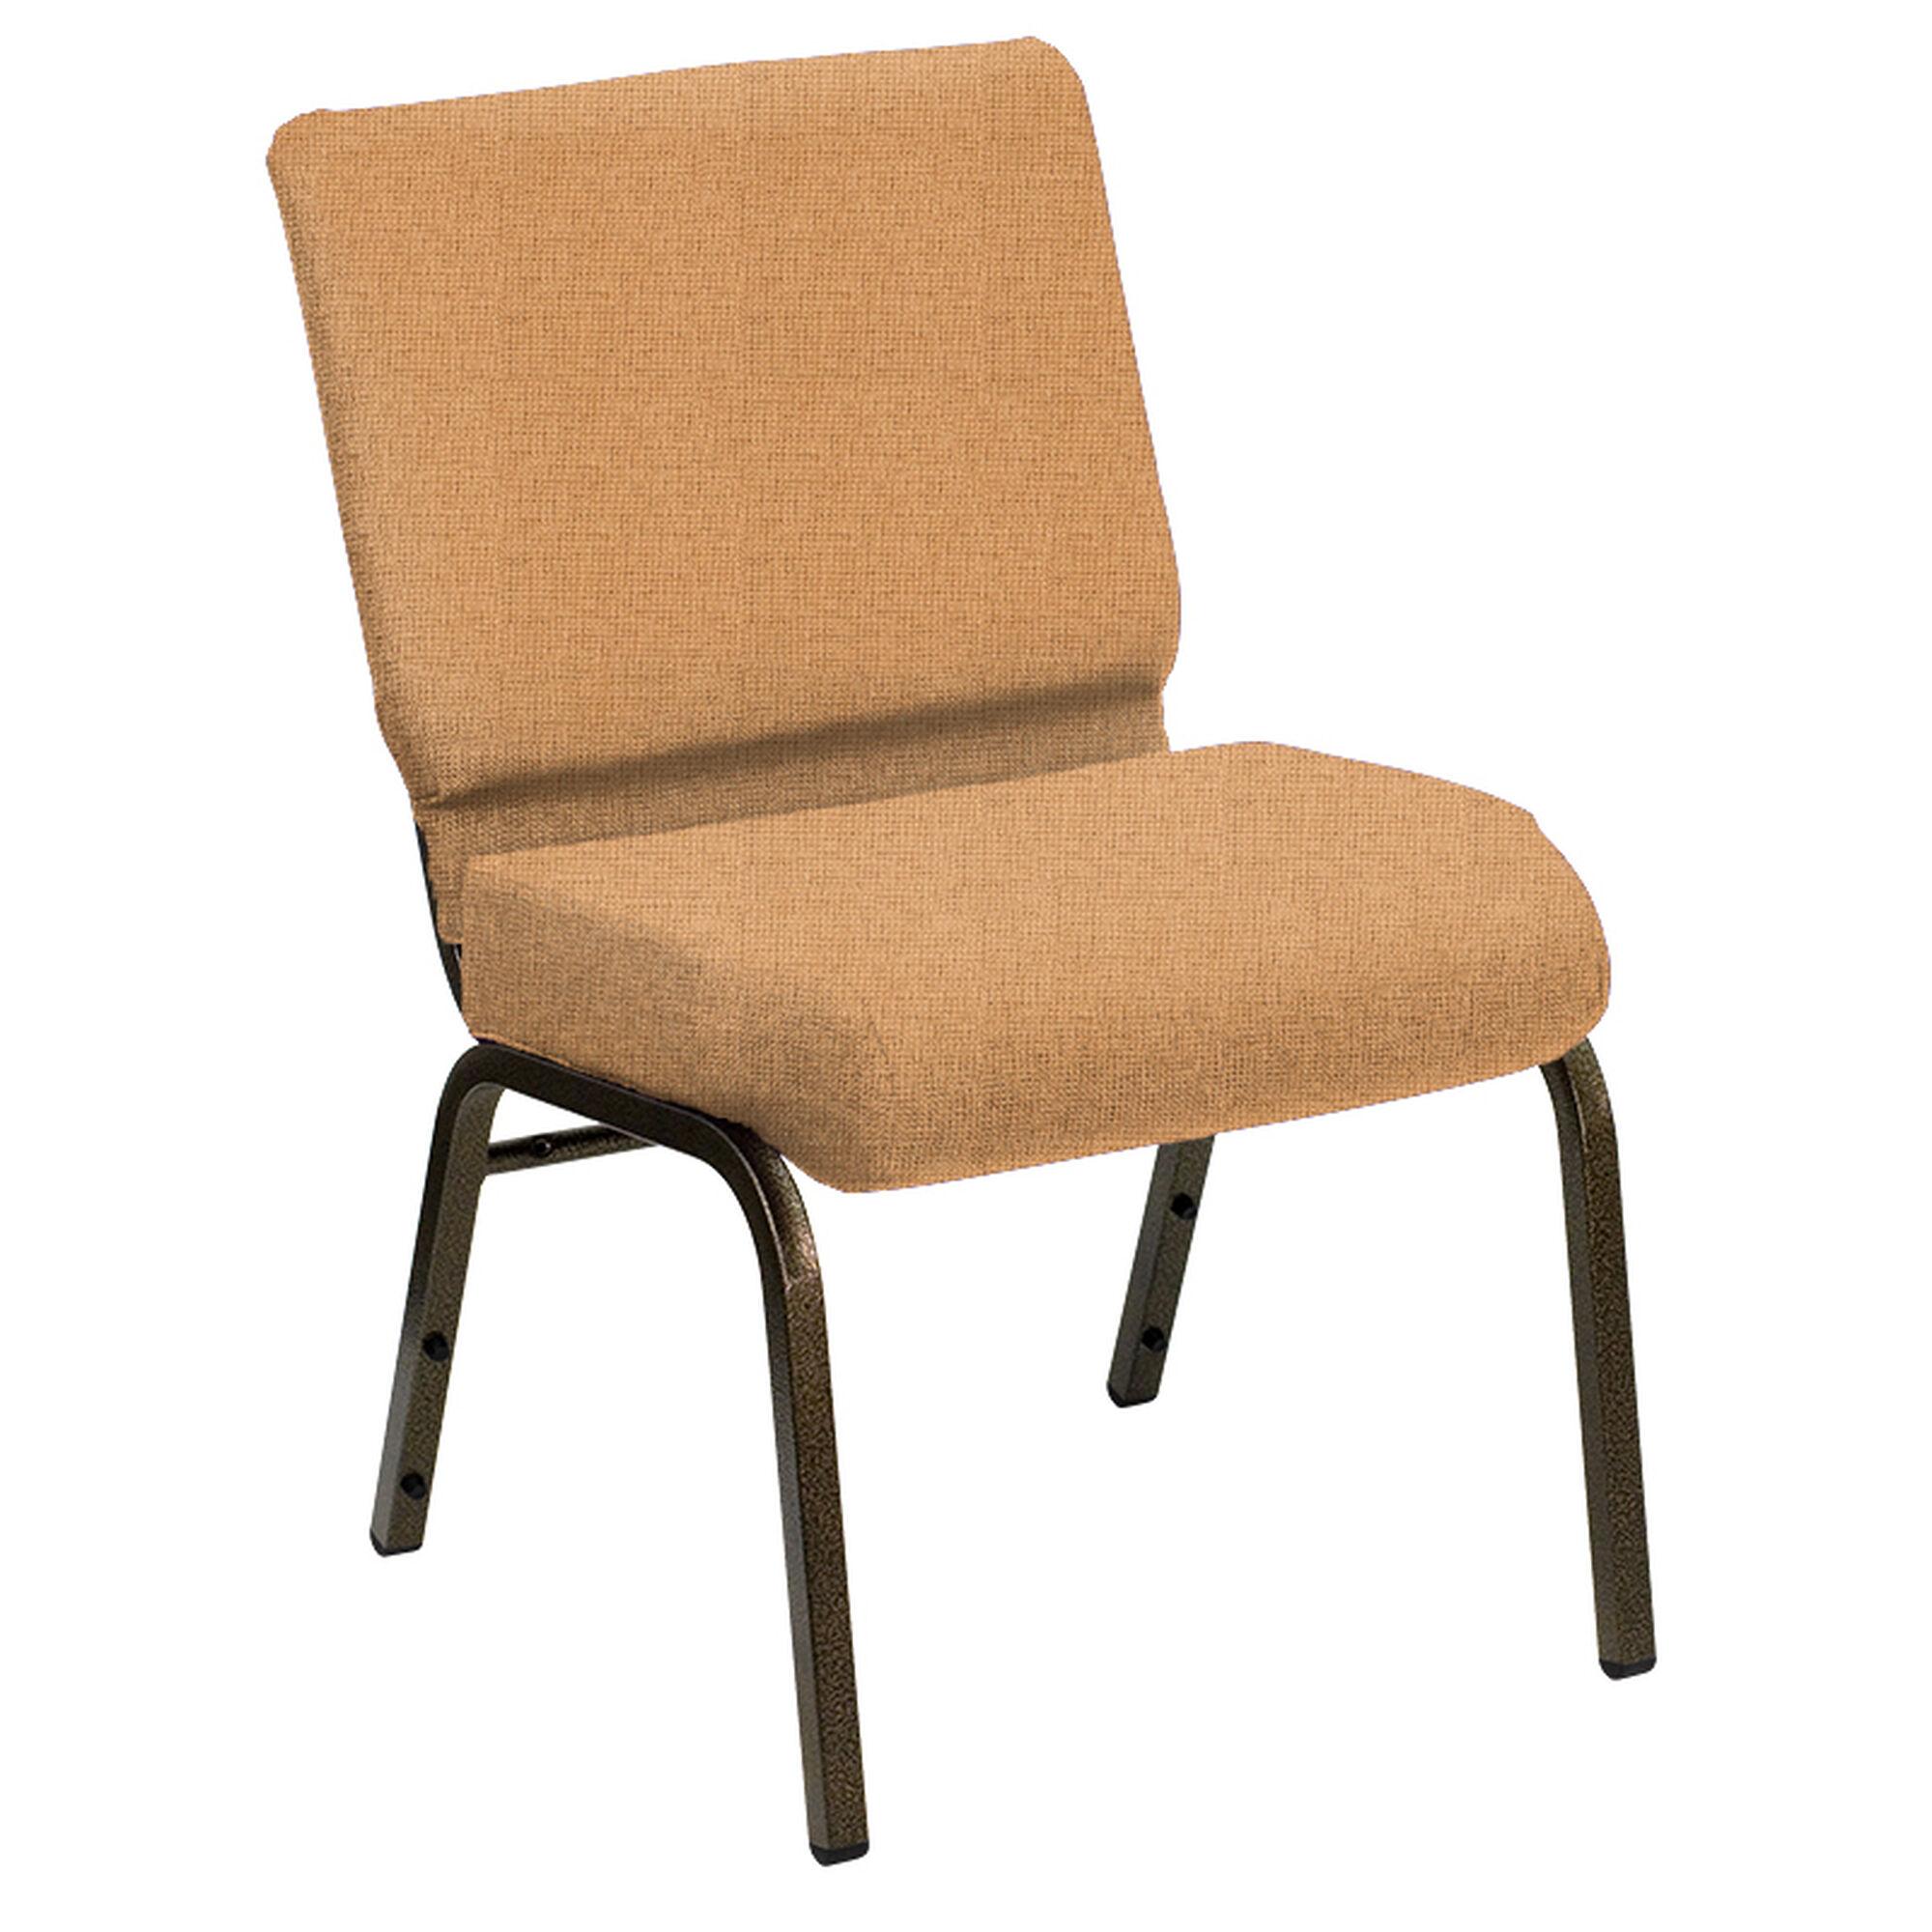 Flash furniture hercules series 21 39 39 w church chair in for Furniture 4 less